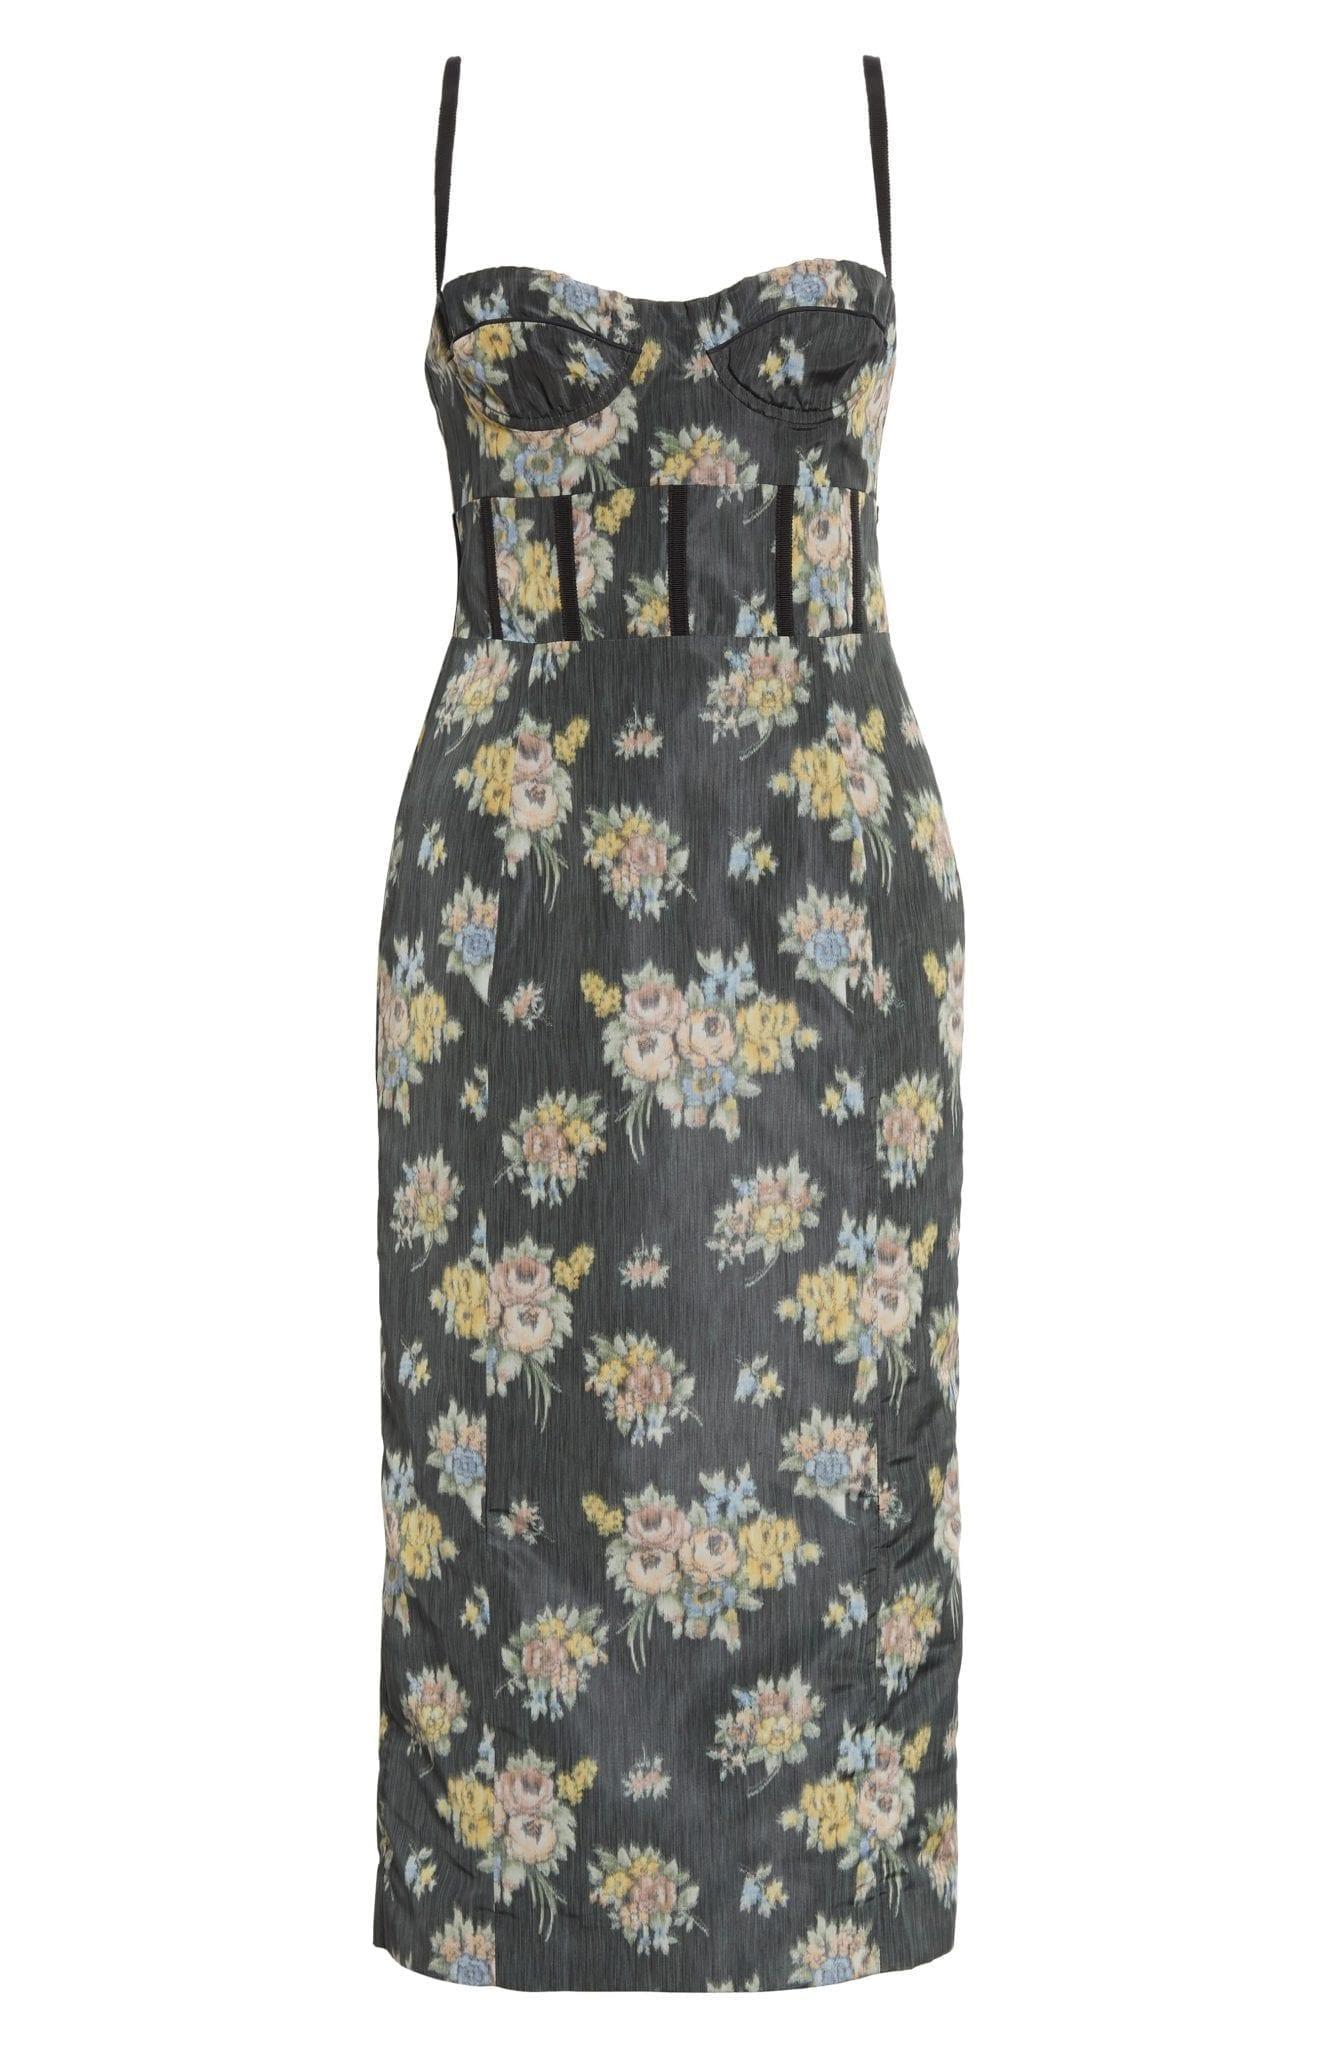 BROCK COLLECTION Floral Print Bustier Dress